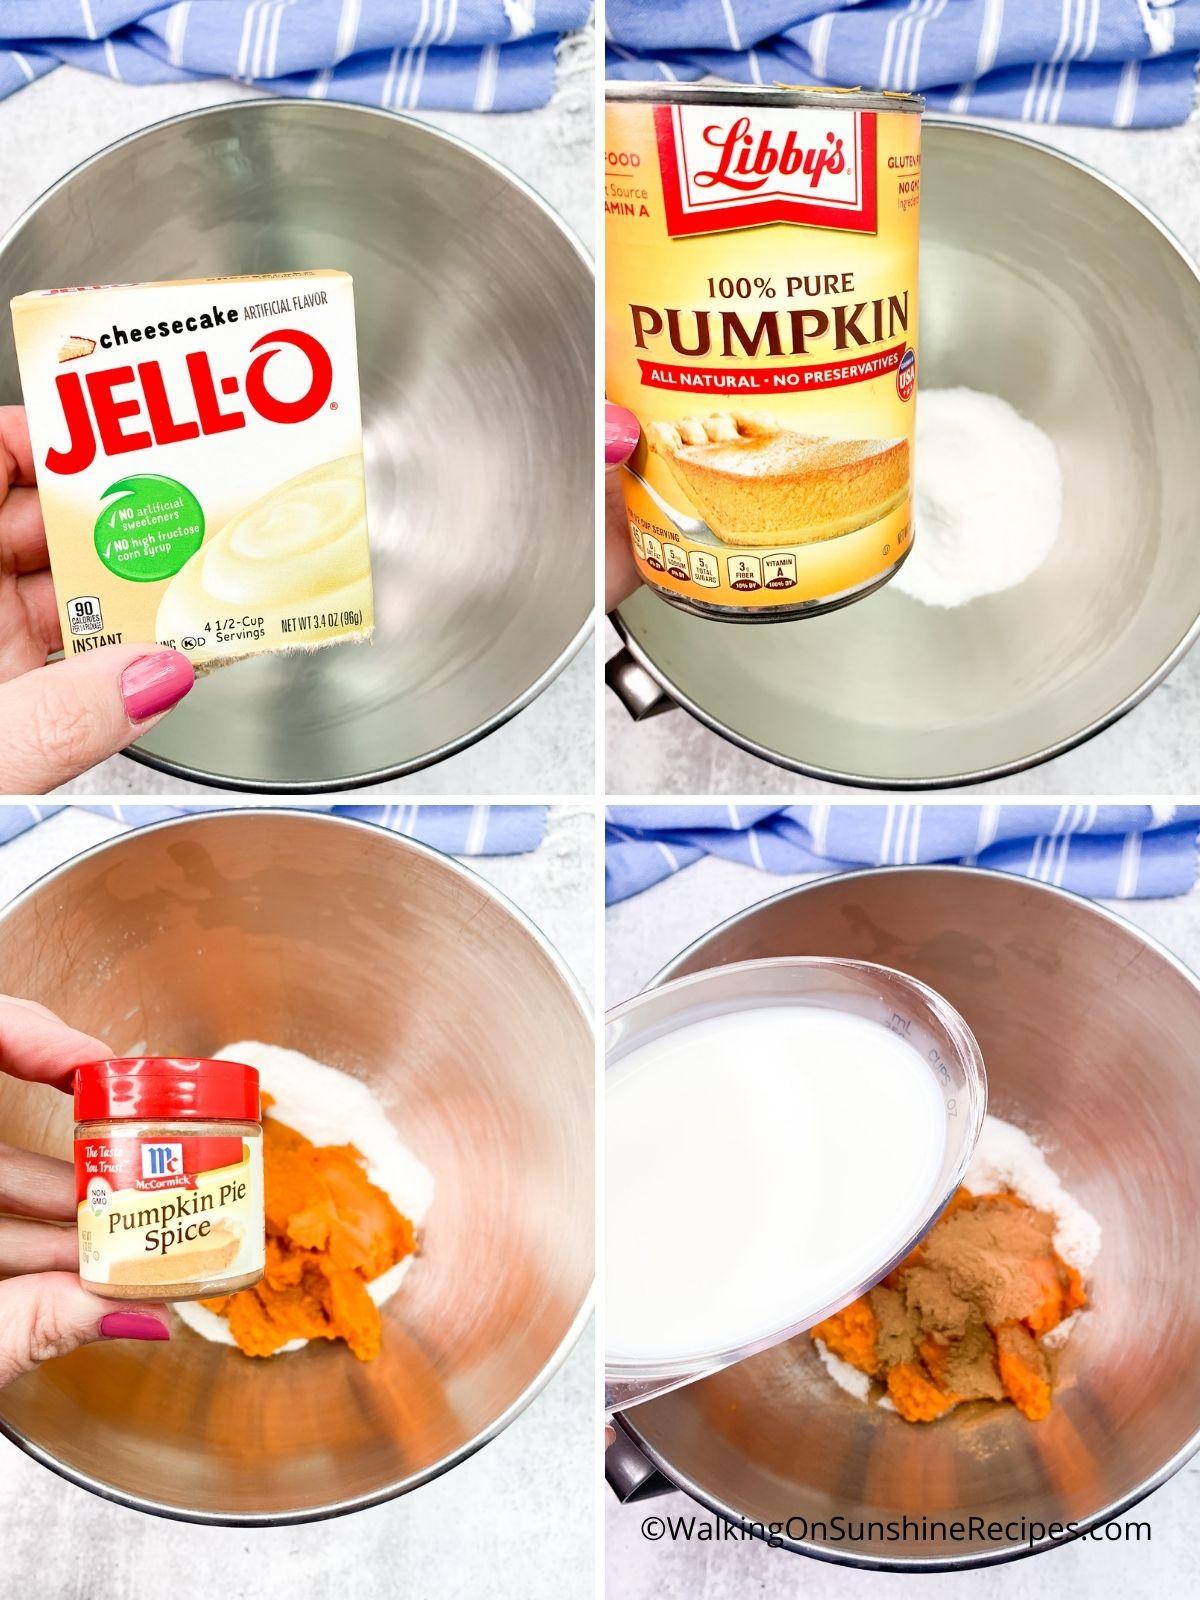 Add pudding mix, pumpkin and milk.